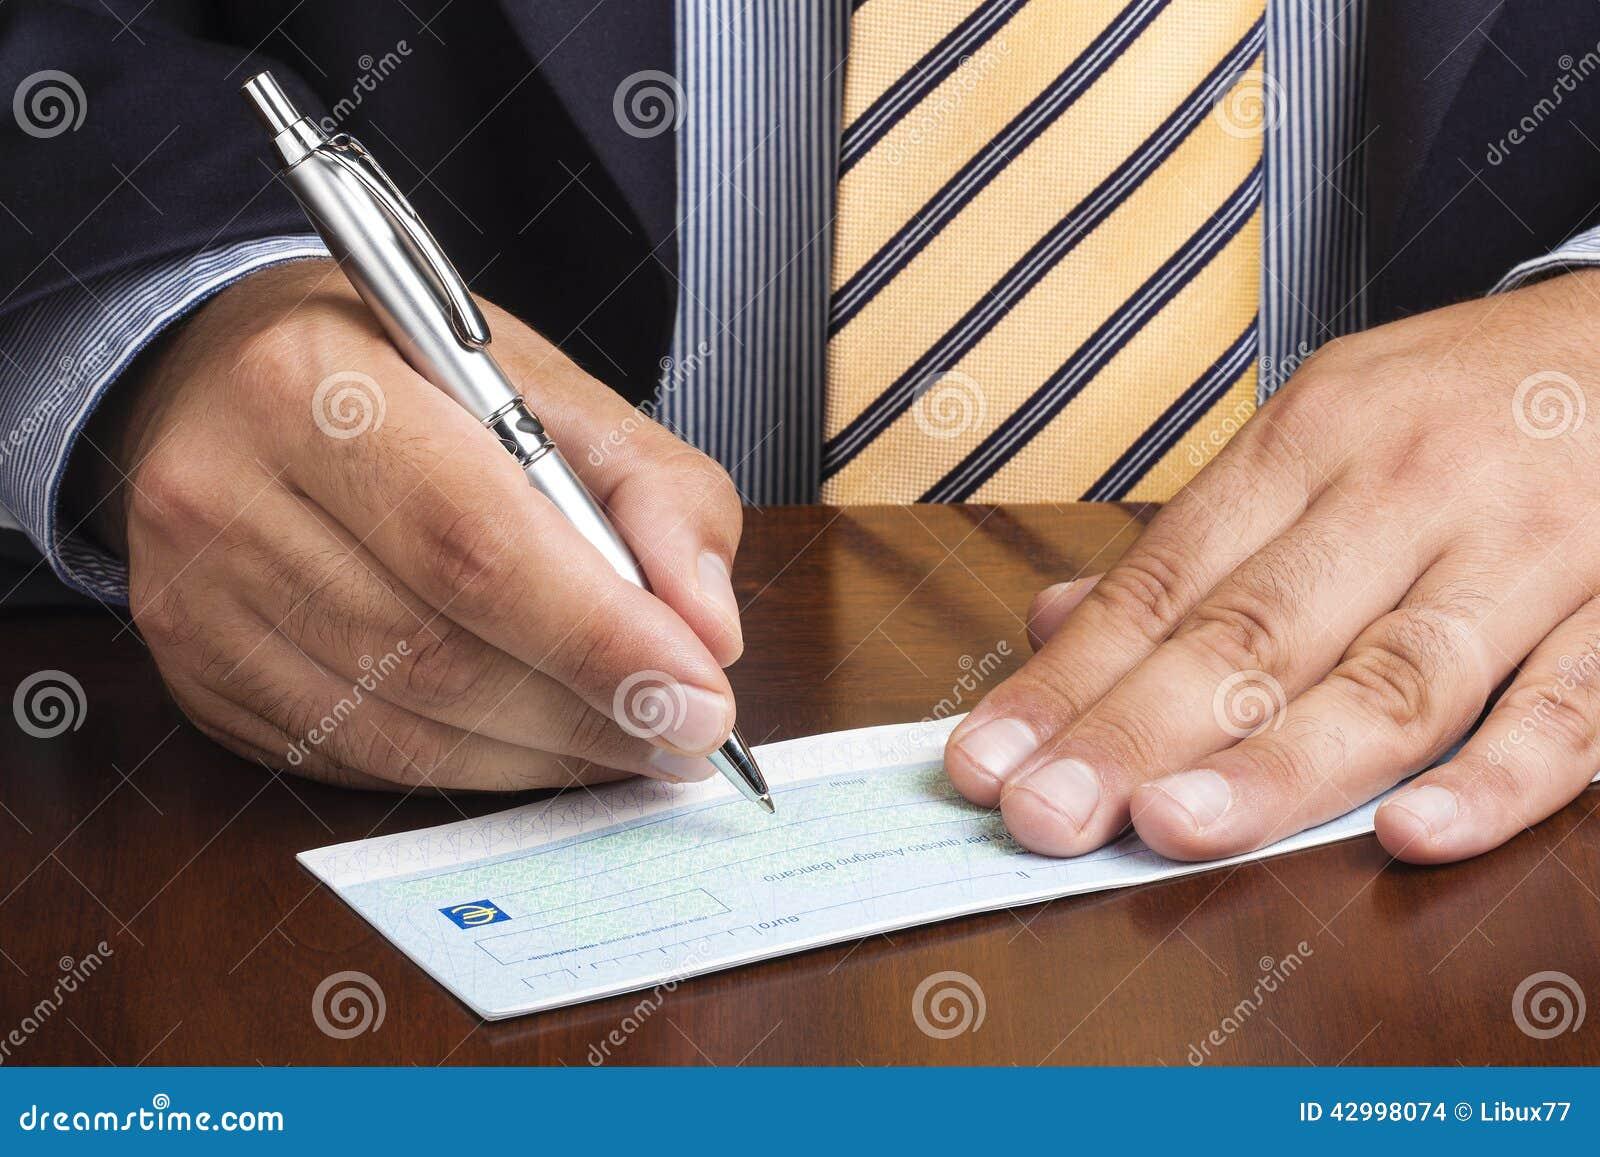 Lazo del bolígrafo de Writing Blank Check del hombre de negocios